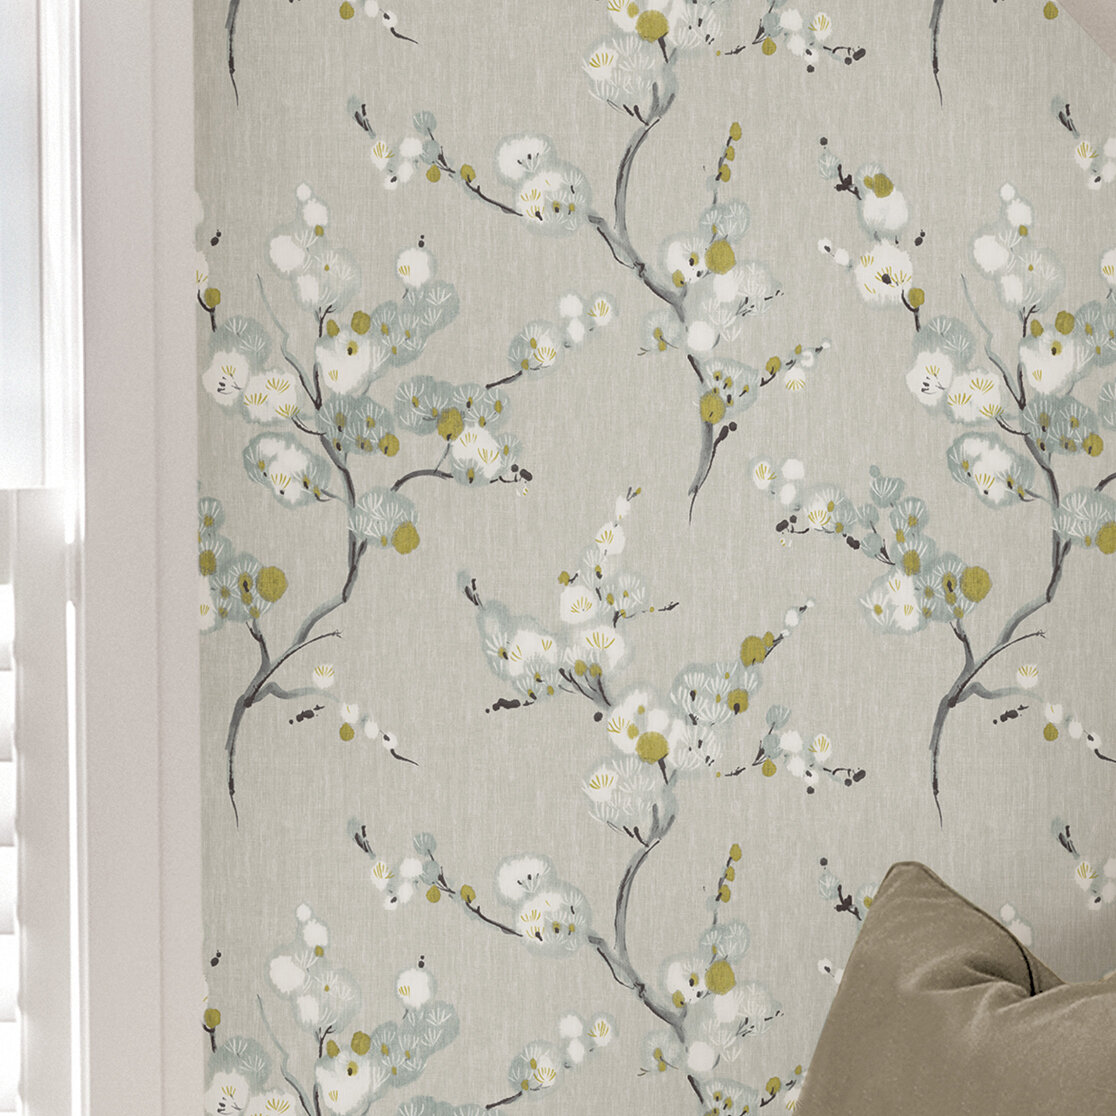 crediton 18 l x 205 w texture peel and stick wallpaper roll